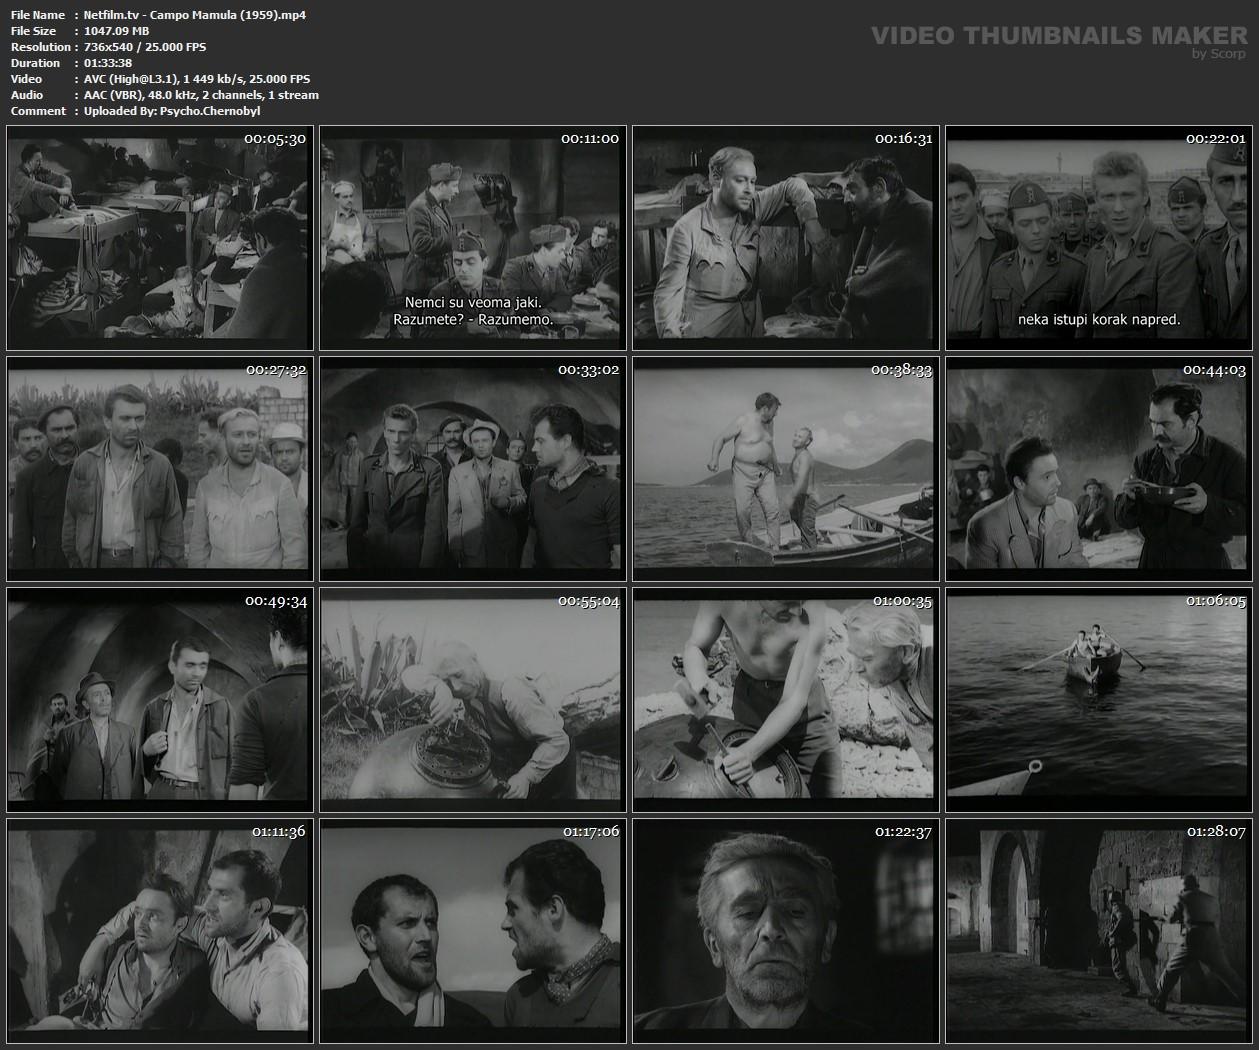 Netfilm-tv-Campo-Mamula-1959-mp4.jpg